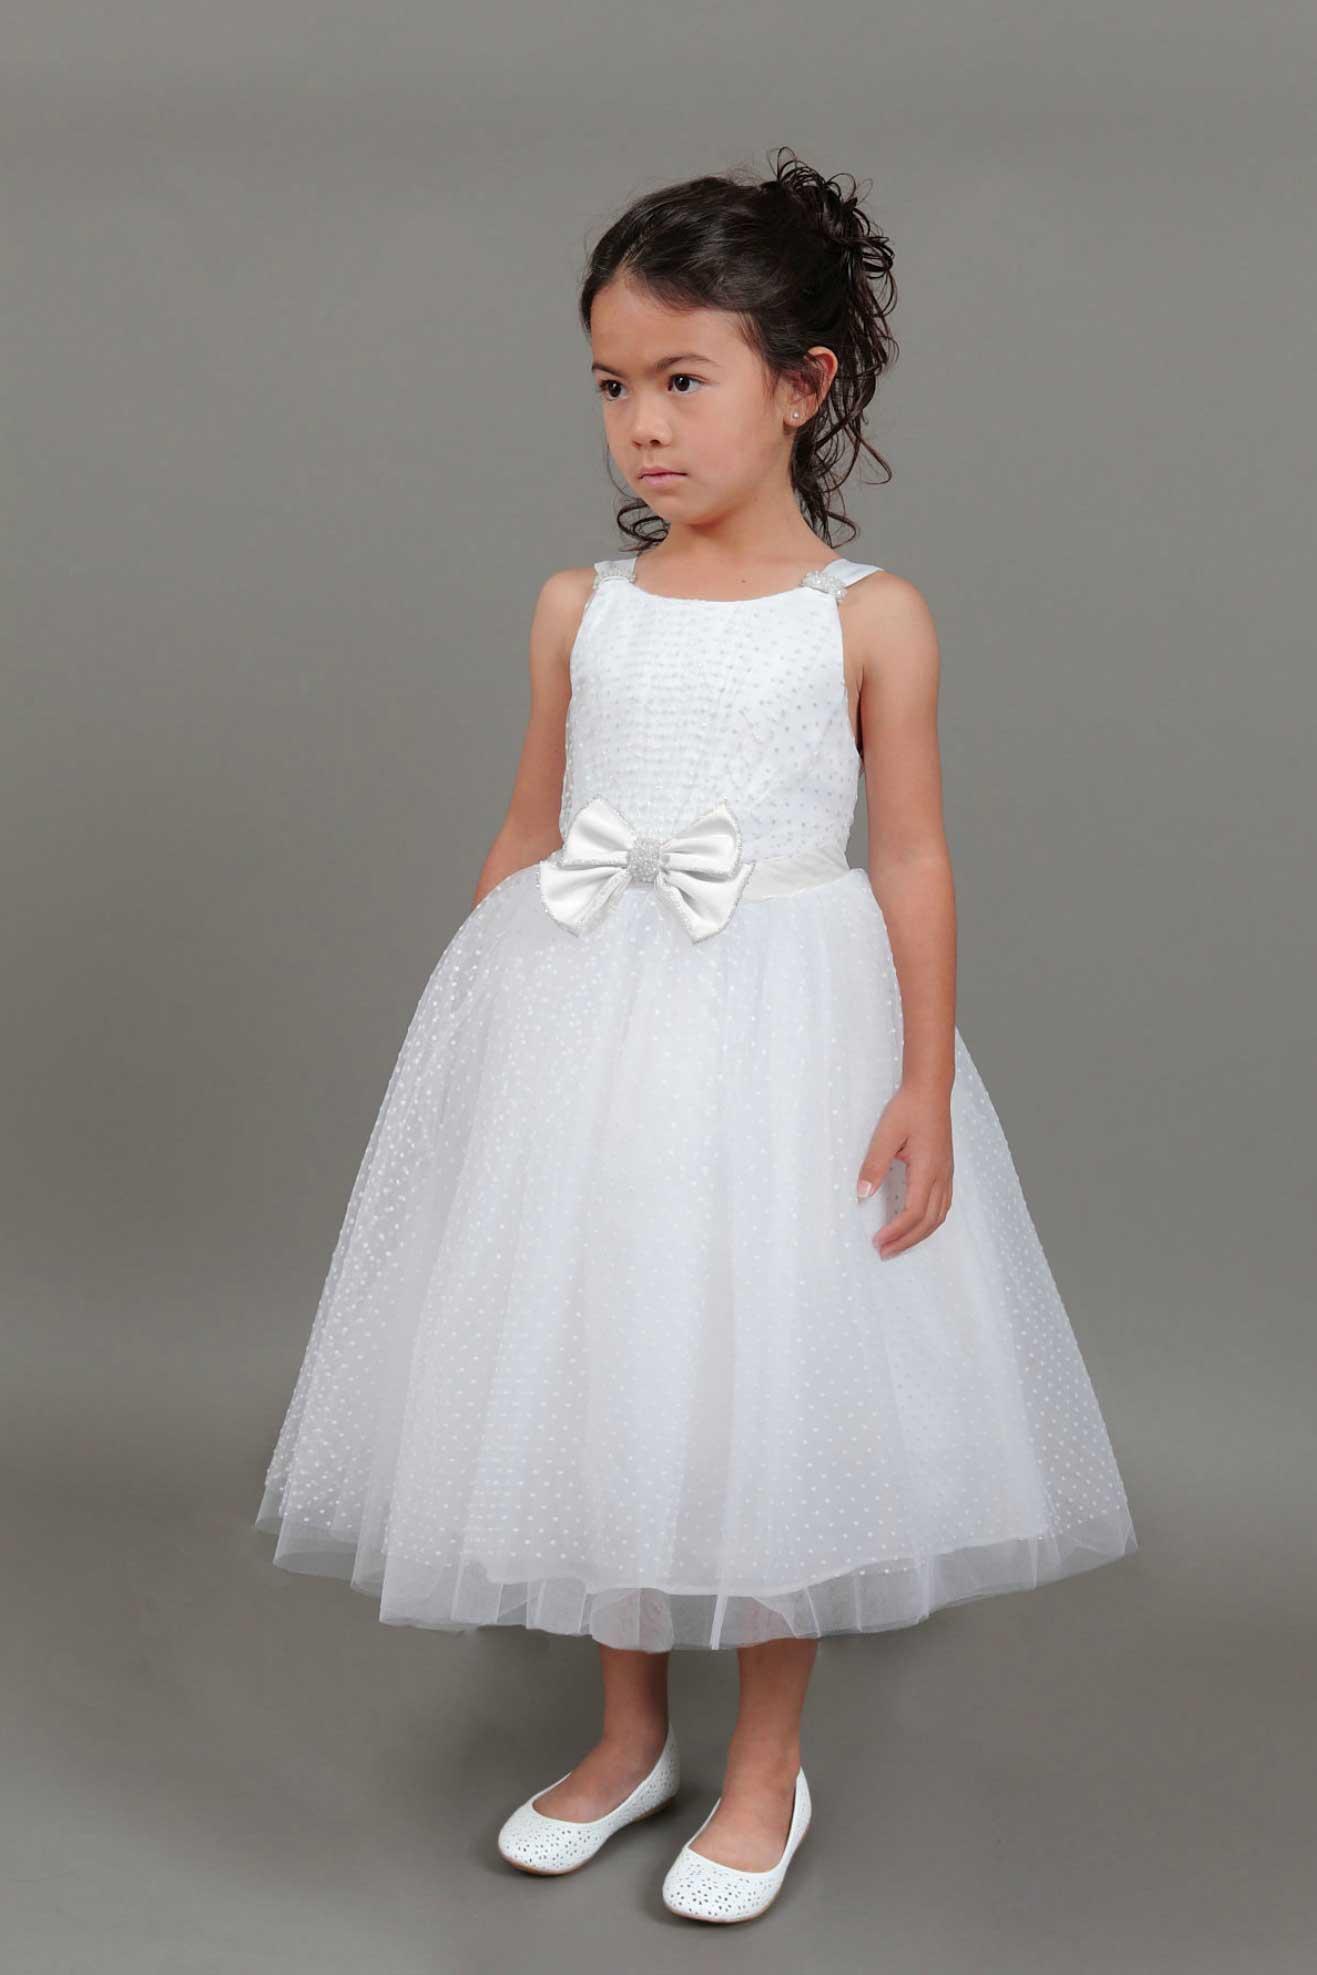 Ic 5370 Girls Dress Style 5370 Isobella And Chloe